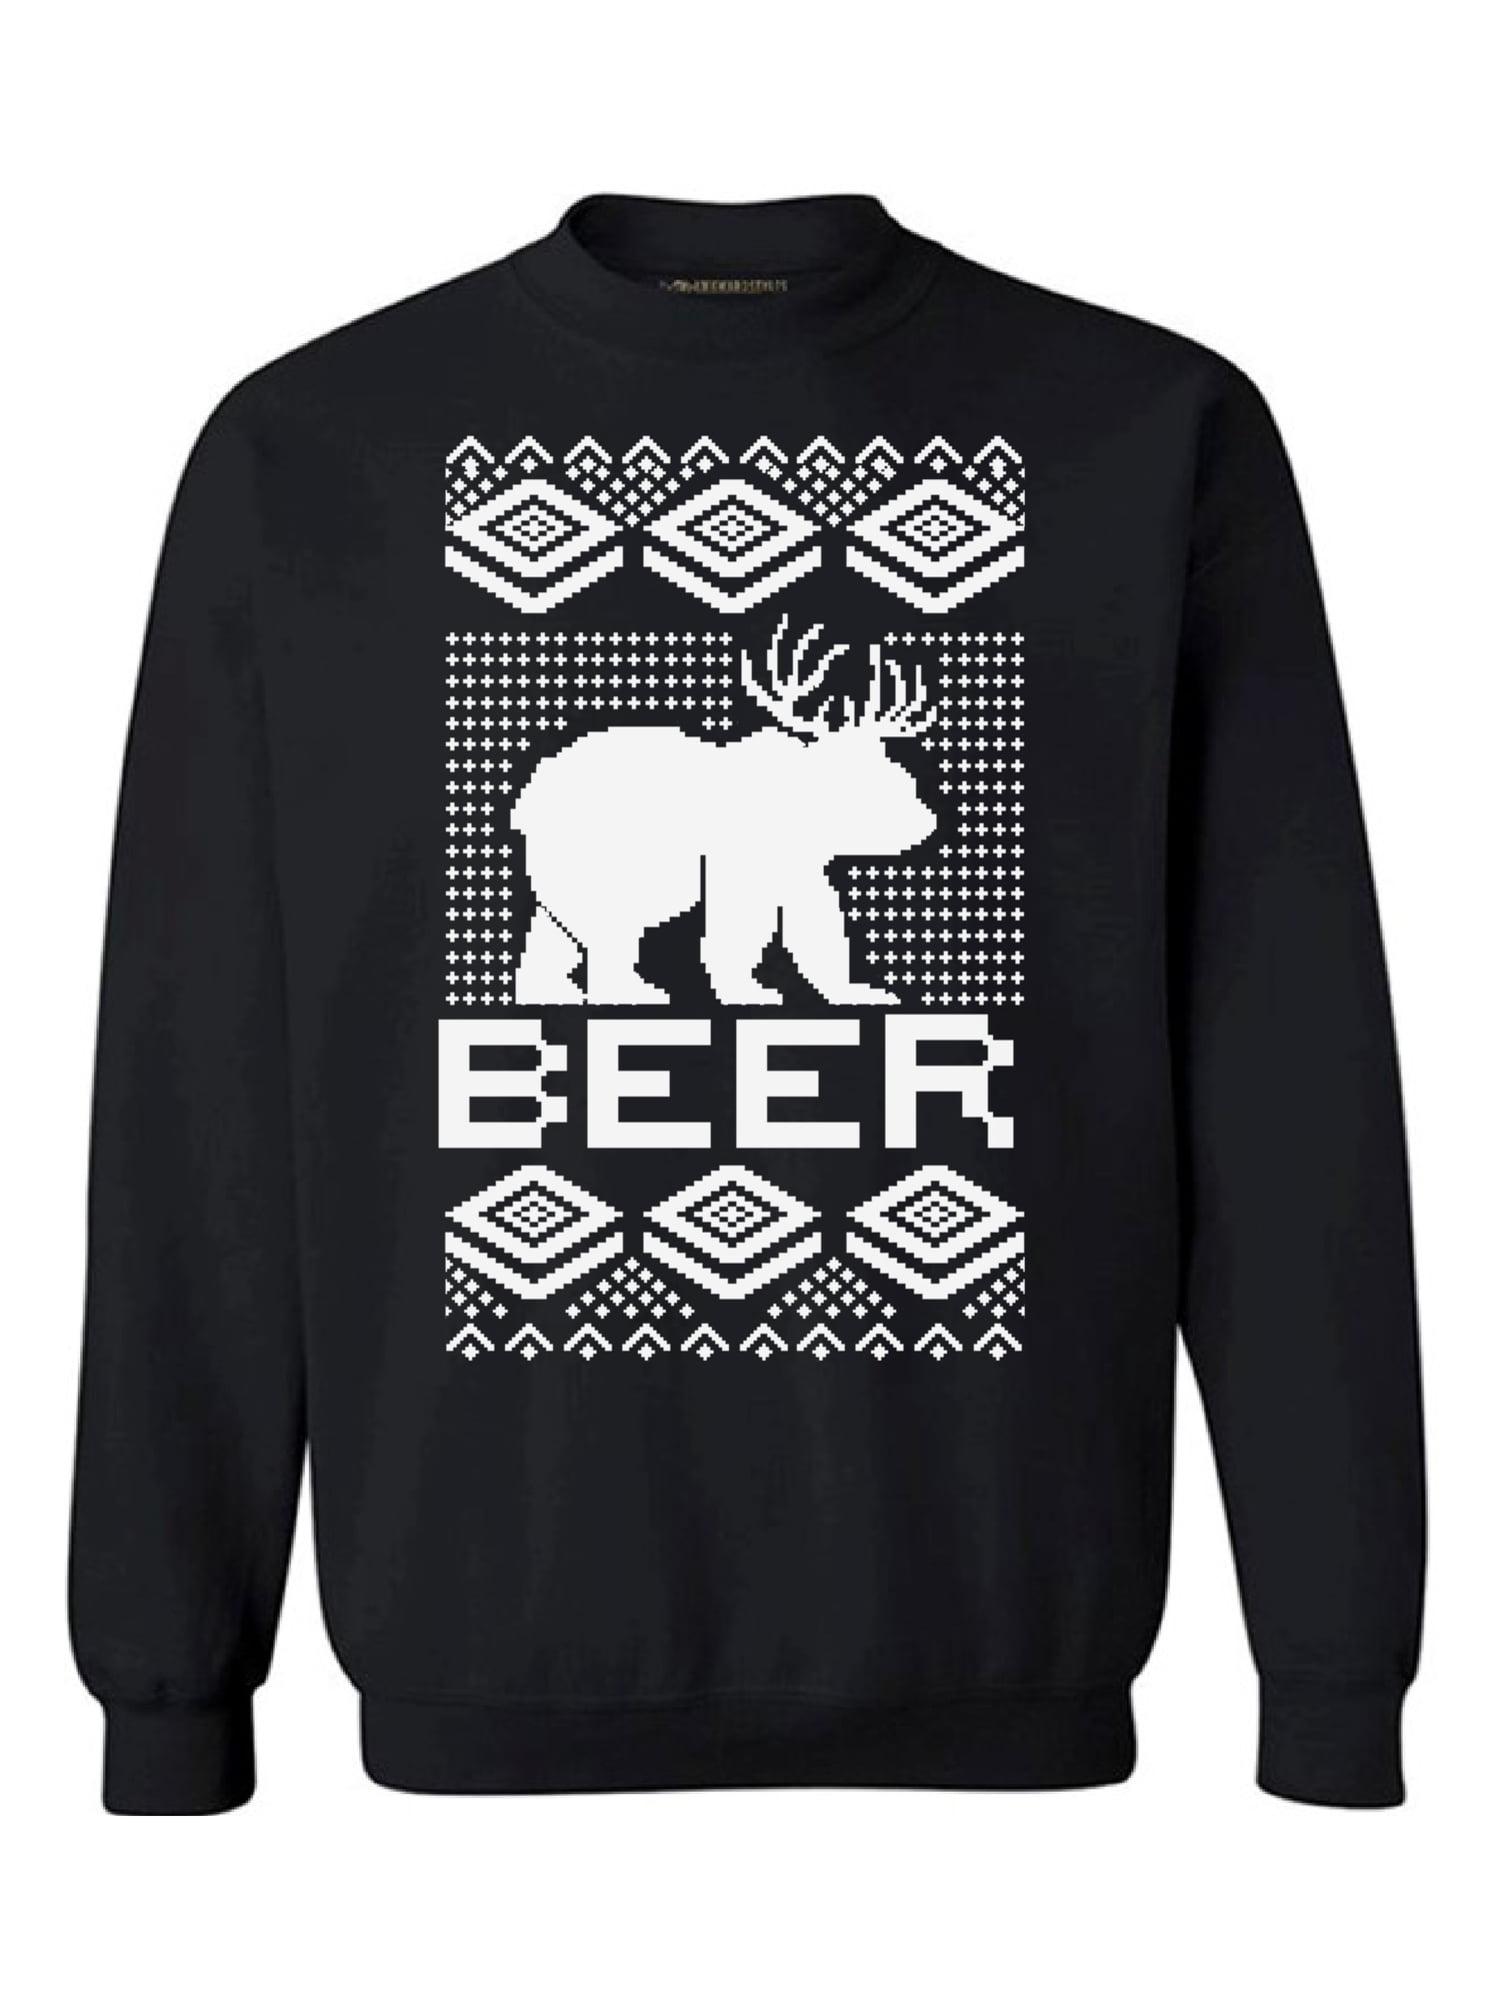 Awkward Styles Beer Bear Deer Christmas sweatshirt Xmas Holiday Sweatshirt Bear with Antlers Ugly Christmas Sweater Funny Christmas Sweater Party Xmas